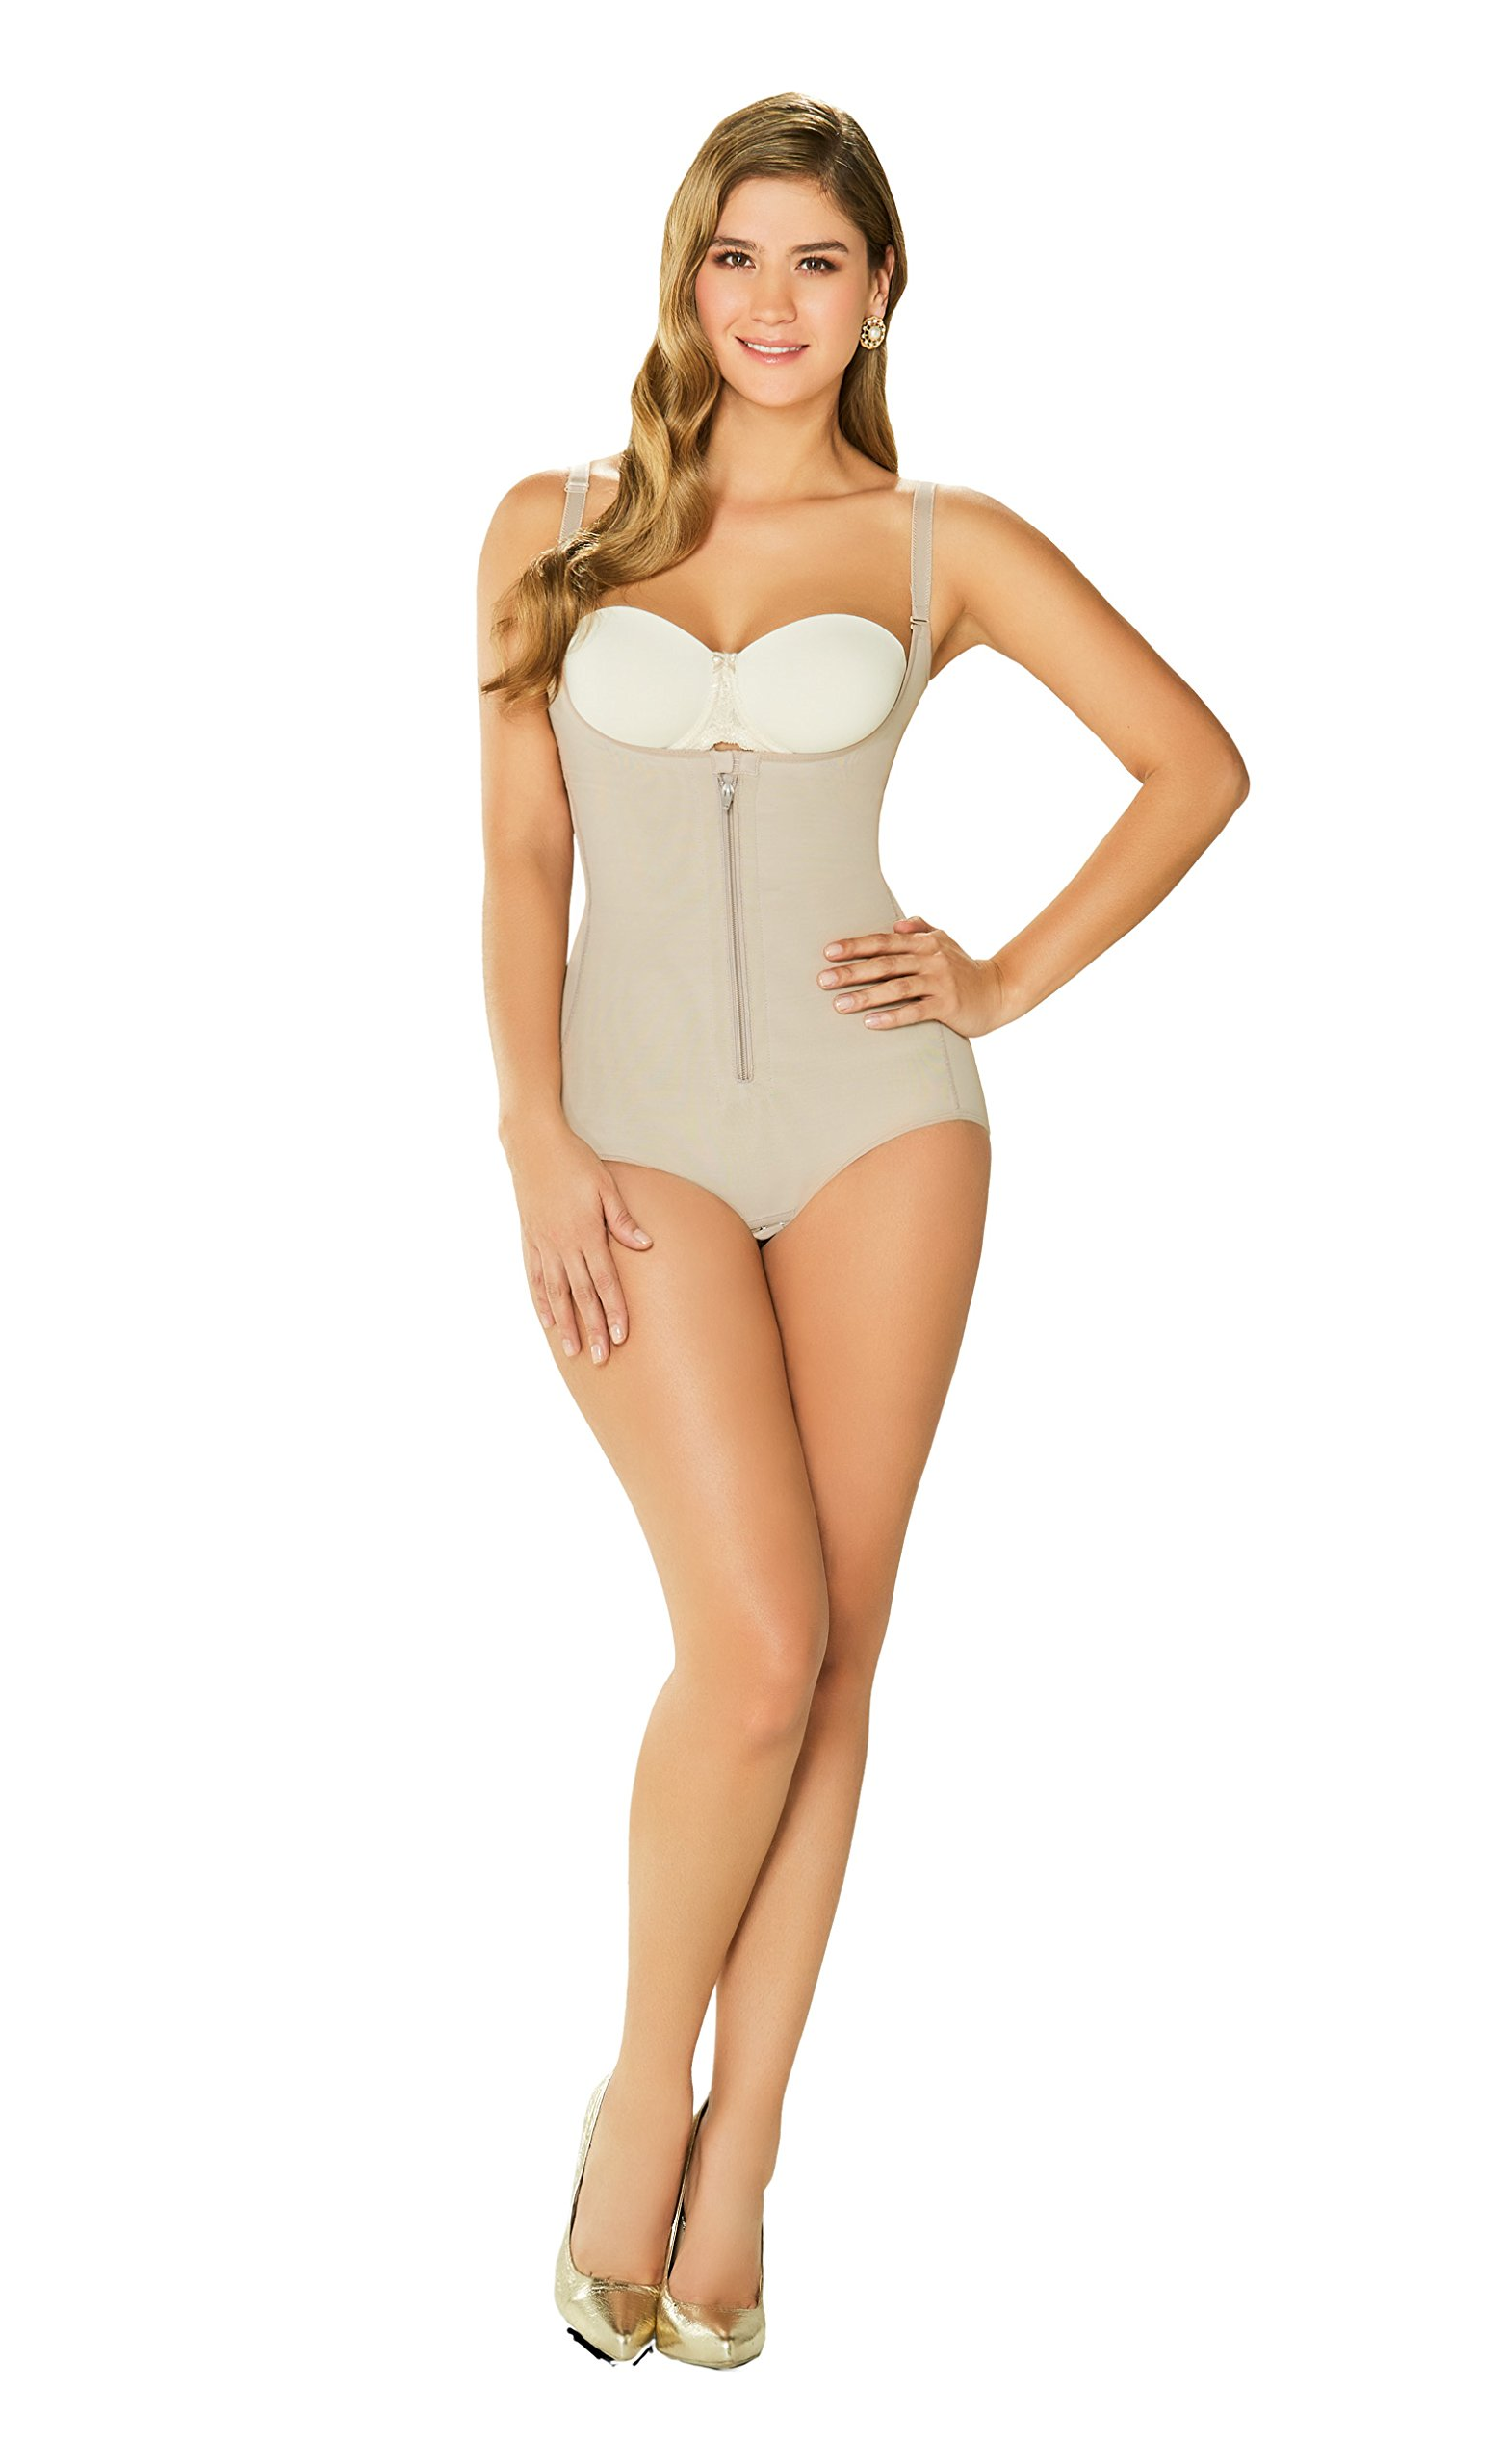 DIANE & GEORDI 2411 Strapless Tummy Control Shapewear for Women Fajas Colombianas